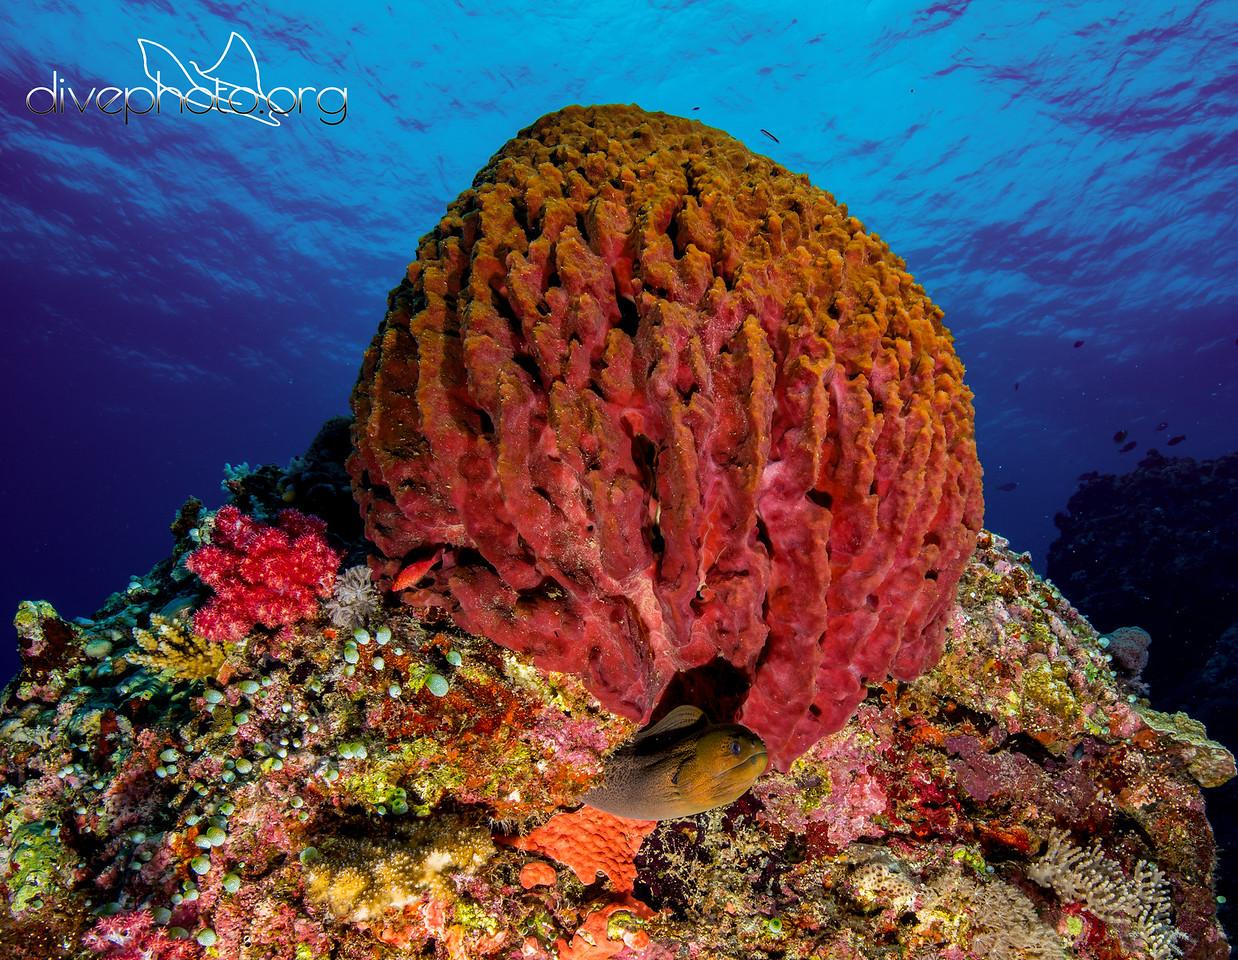 Barrel sponge and moray